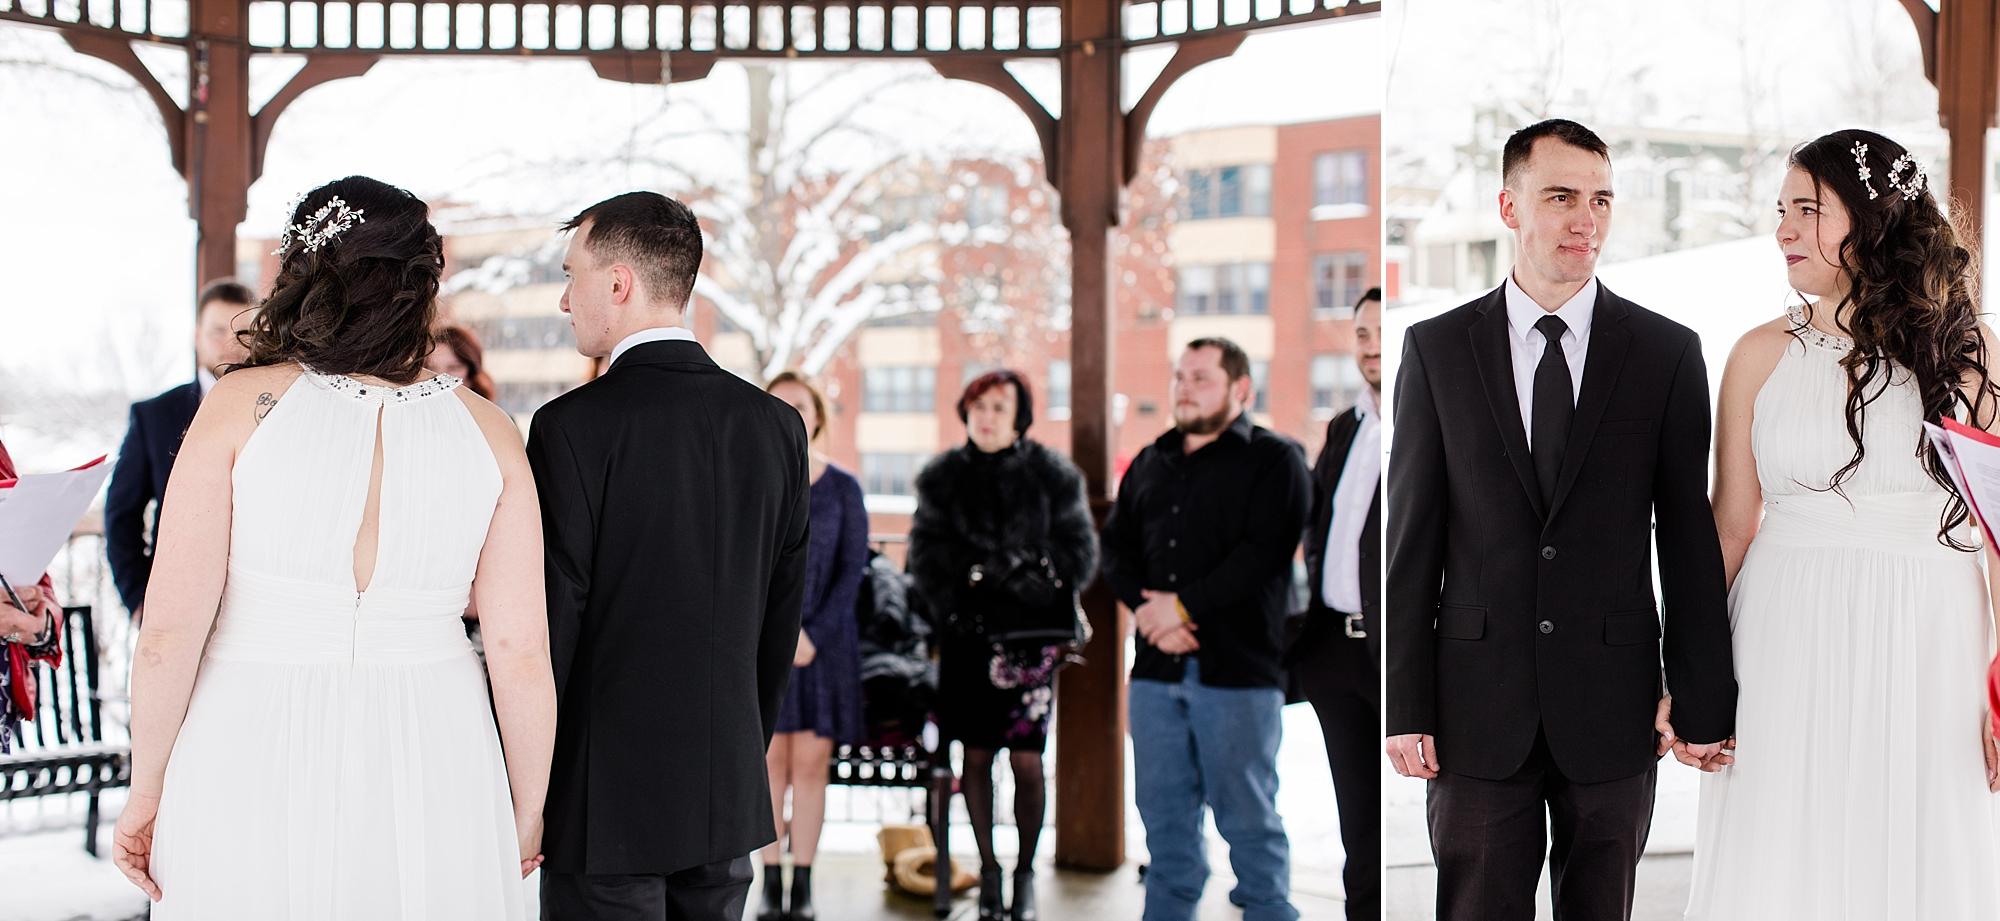 eisleyimages-downtown-marlboro-wedding-newengland_0015.jpg